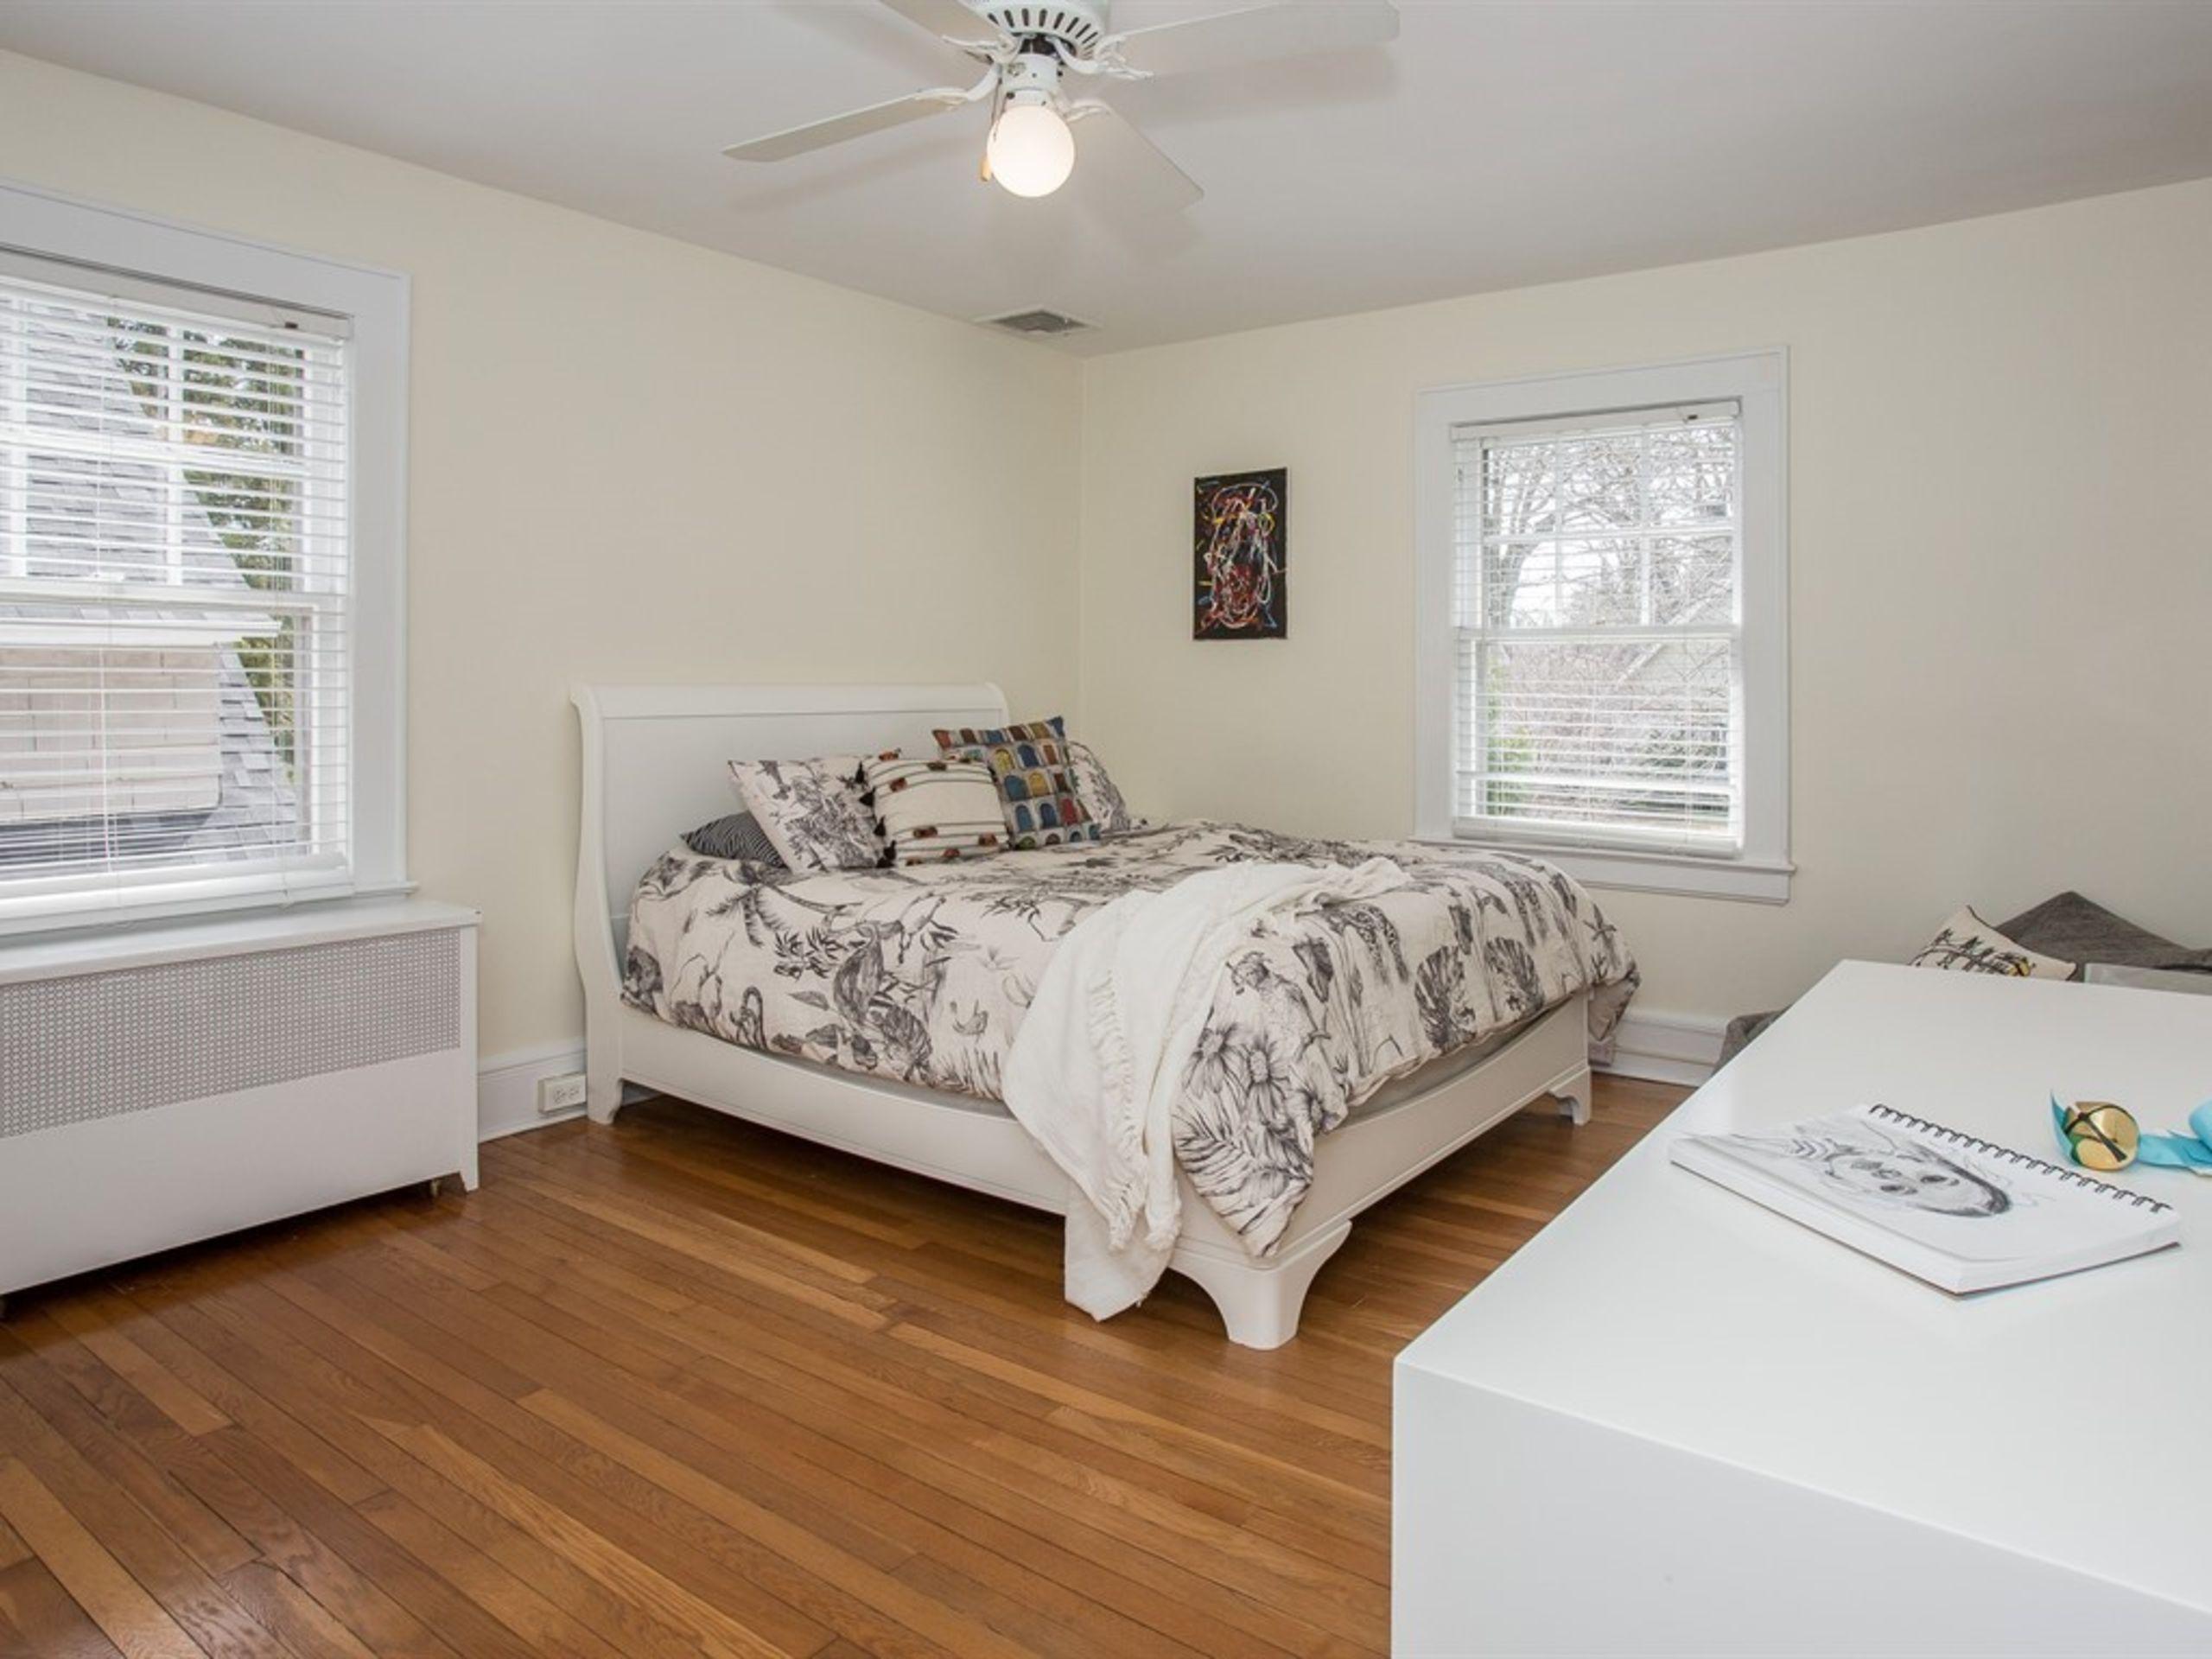 Charming Artist's Bedroom